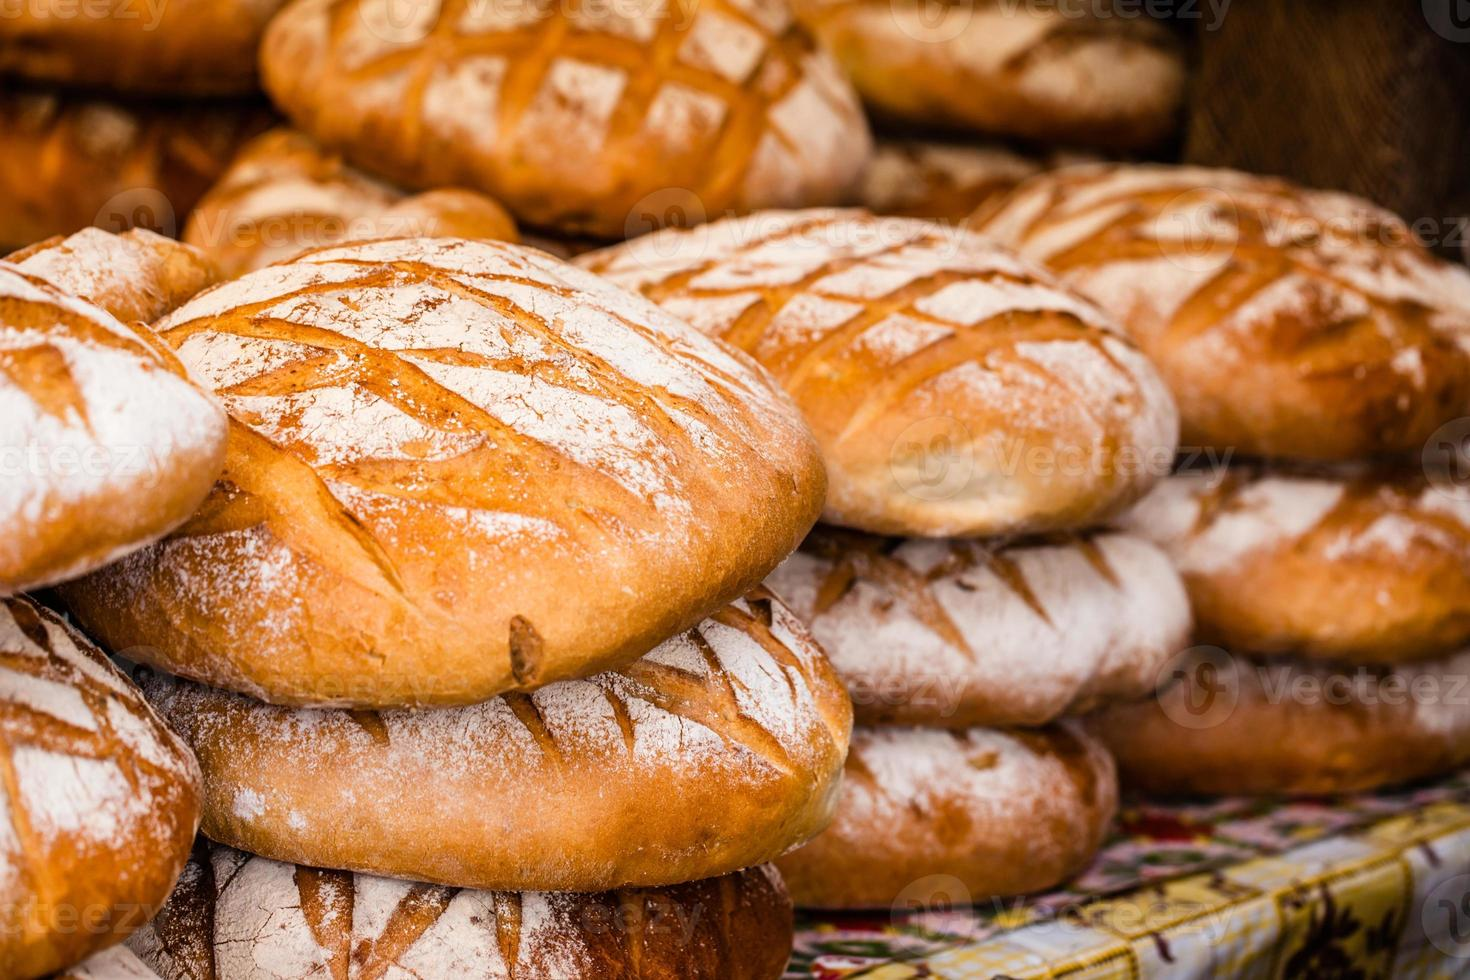 Pan tradicional en el mercado de alimentos polaco, Cracovia, Polonia. foto